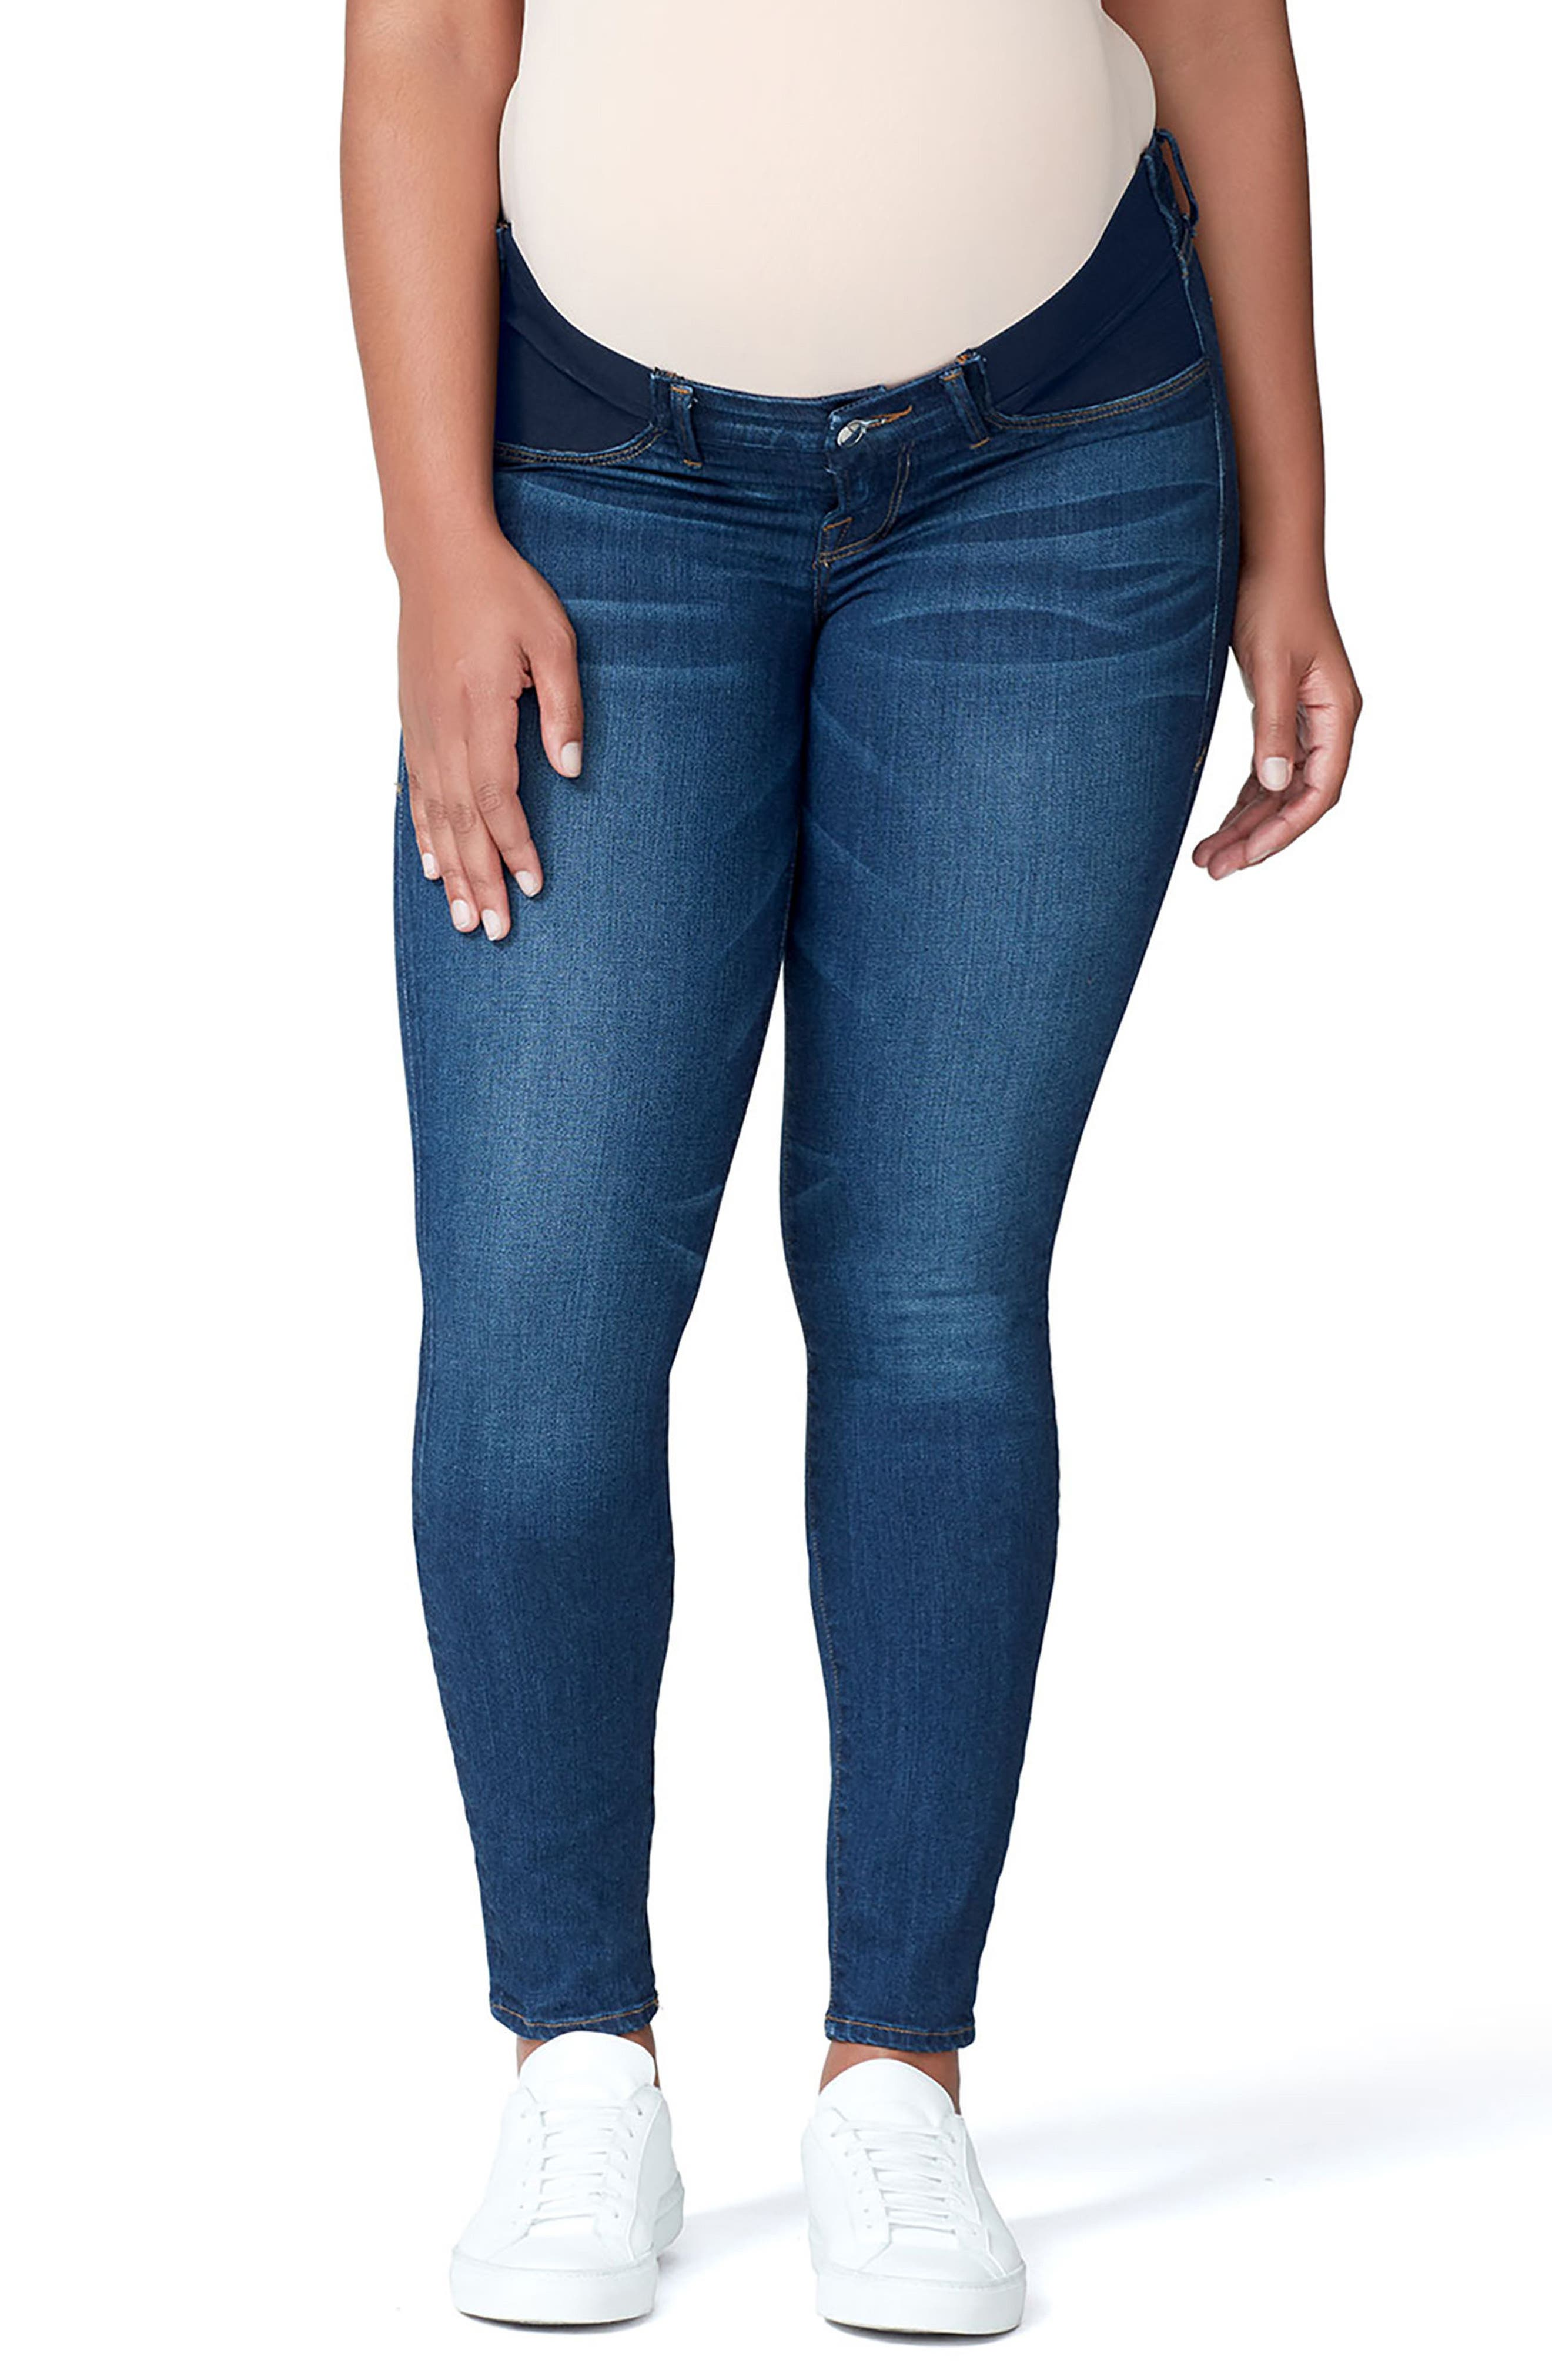 Women's Good American Good Mama The Honeymoon Low Rise Maternity Skinny Jeans